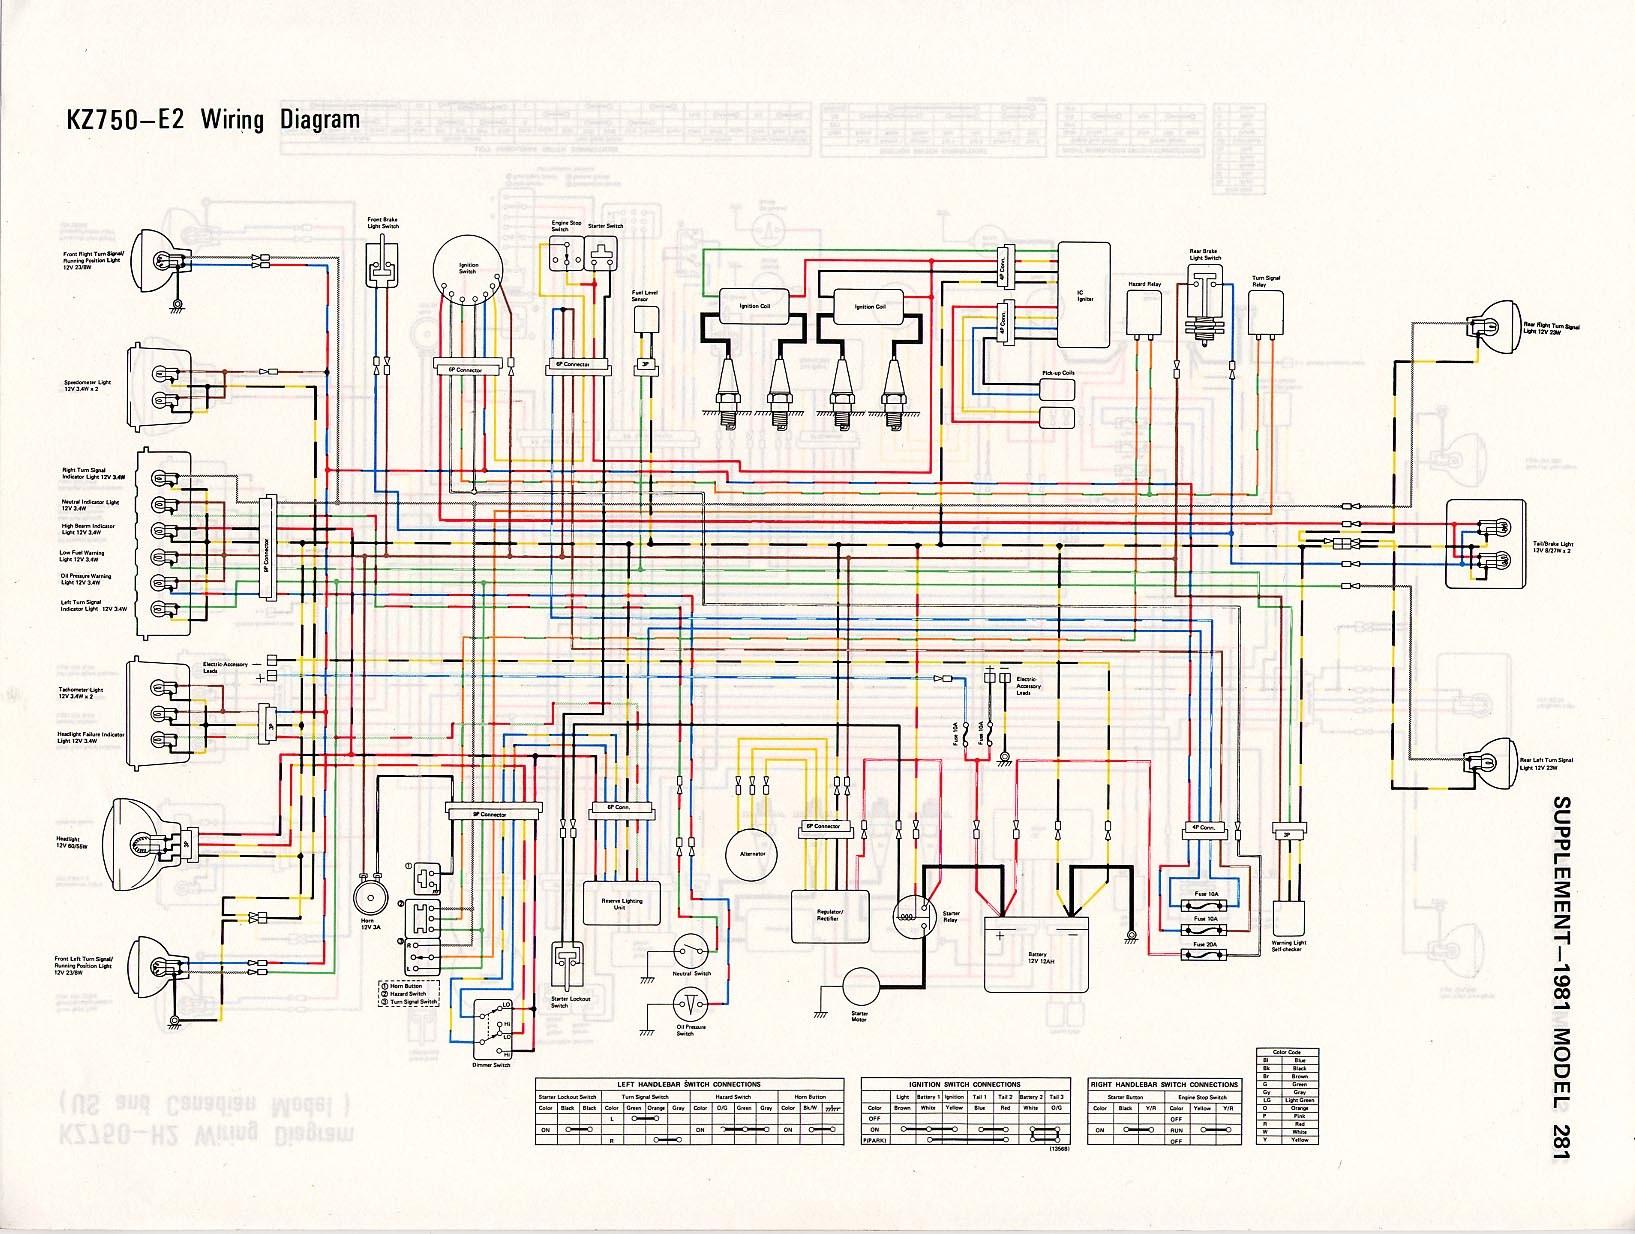 DB_6410] 1986 Honda Rebel Wiring Diagram Likewise Kawasaki Kz750 Twin Wiring  Download DiagramTrofu Dome Mohammedshrine Librar Wiring 101